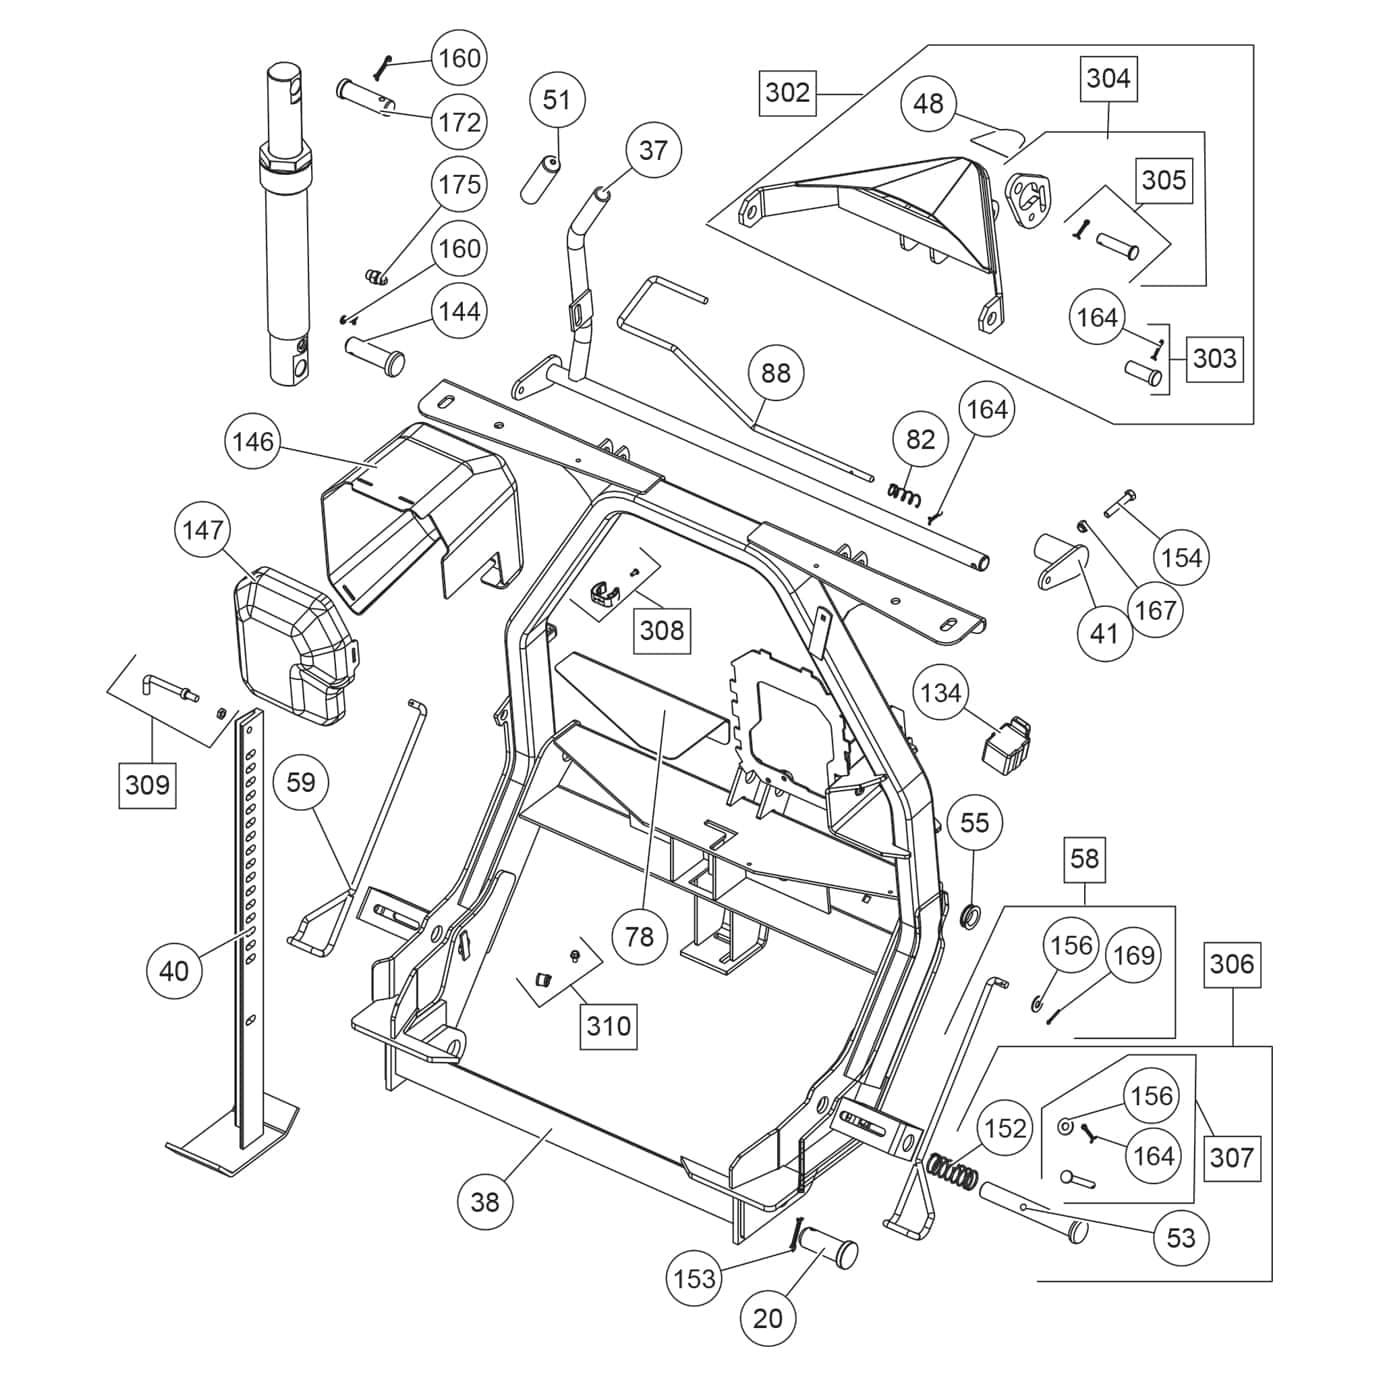 roketa mc 54b wiring diagram fisher mc 4040 wiring diagram